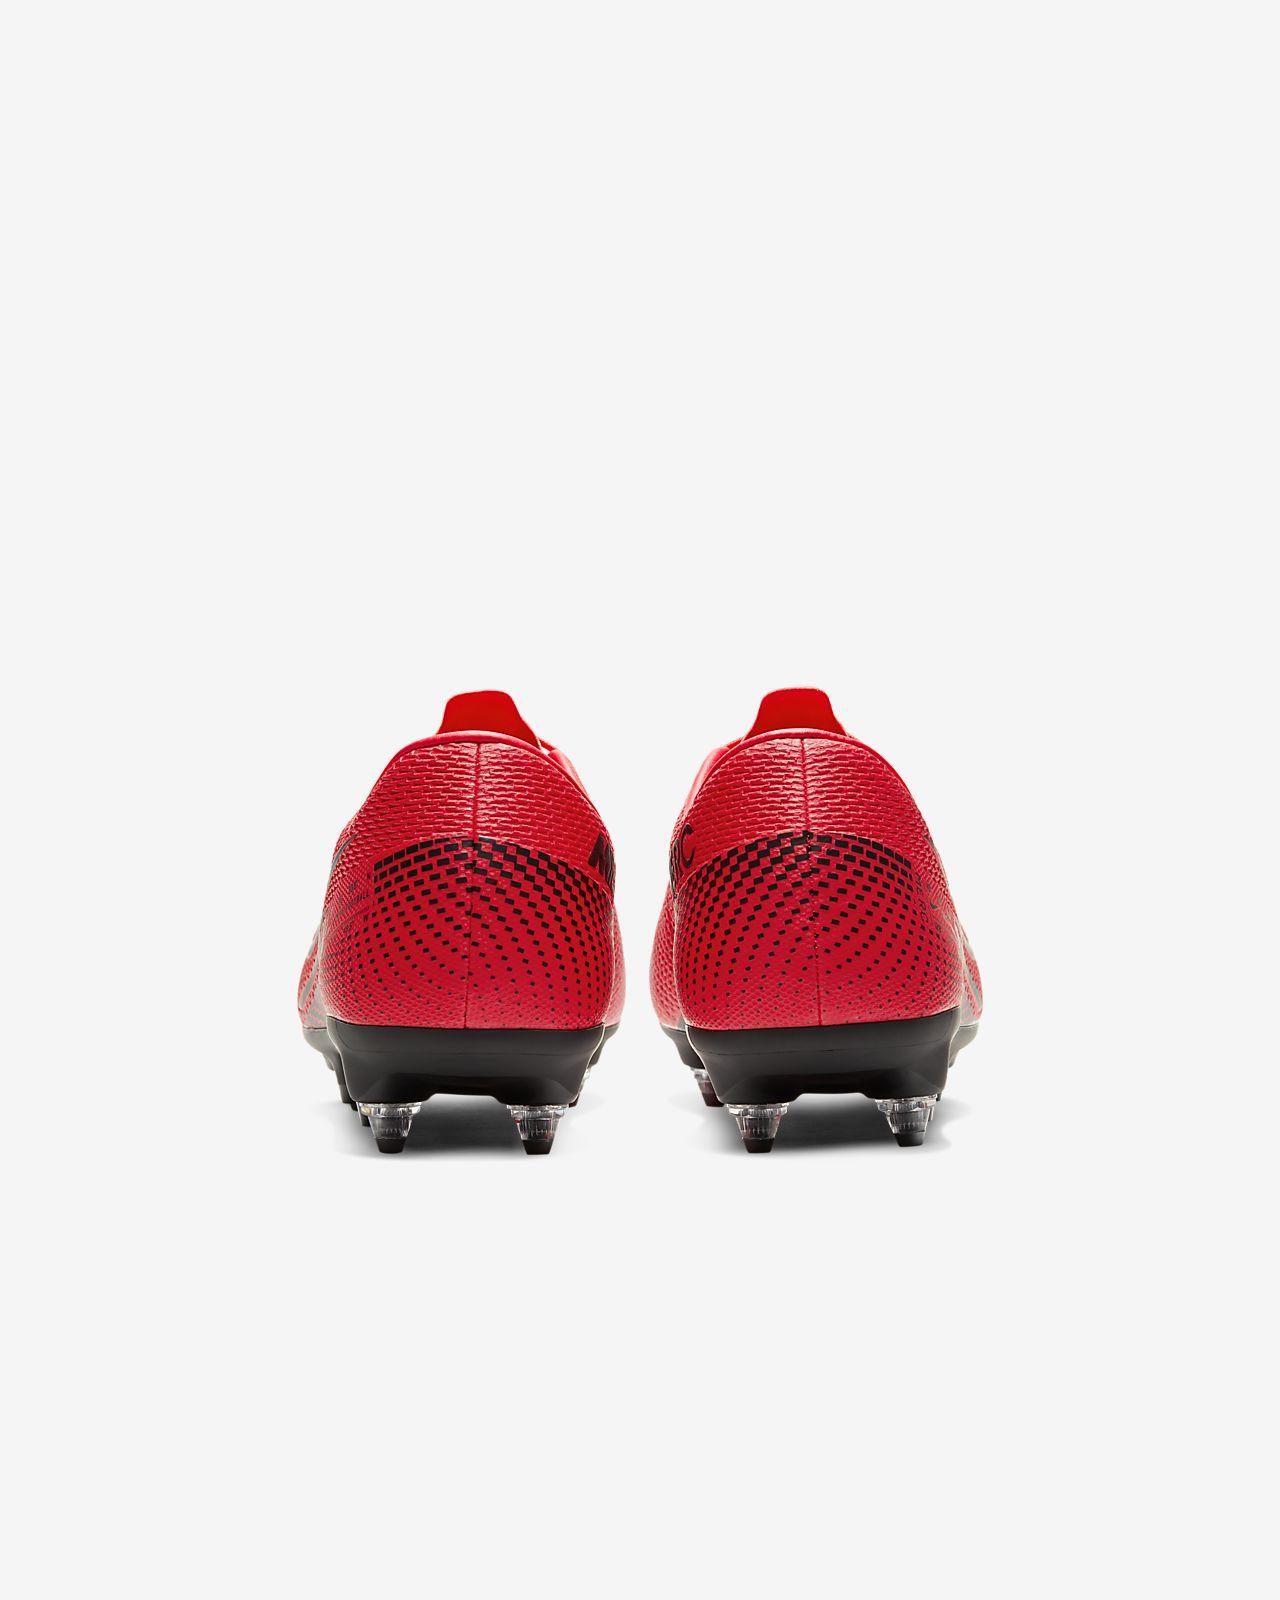 Nike Mercurial Vapor 13 Academy SG PRO Anti Clog Traction Soft Ground Football Boot